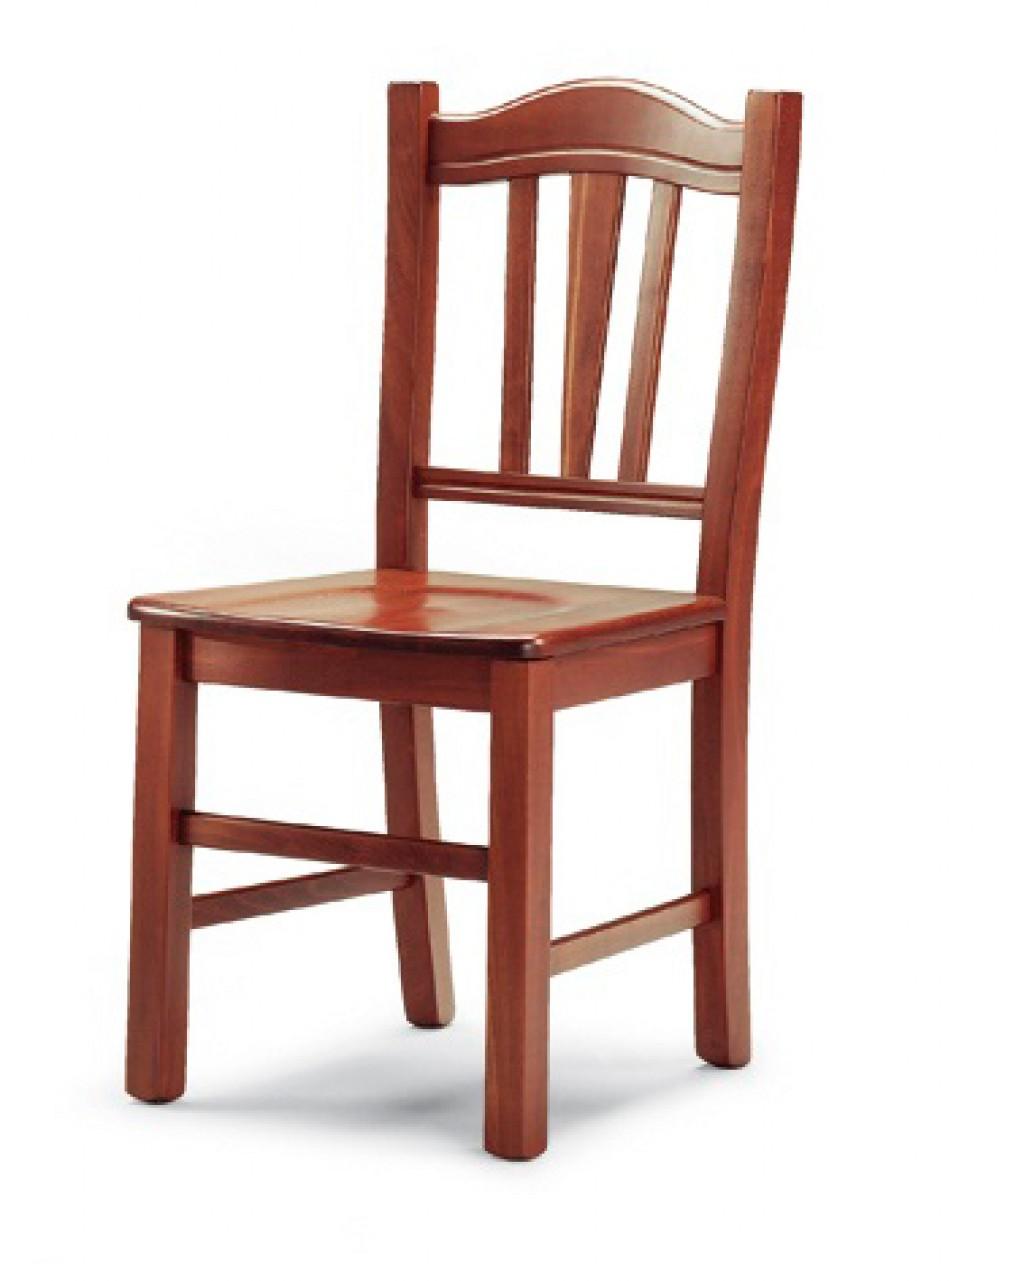 Sedia classica legno iss64 cucine mobili di qualit al for Sedie contemporanee